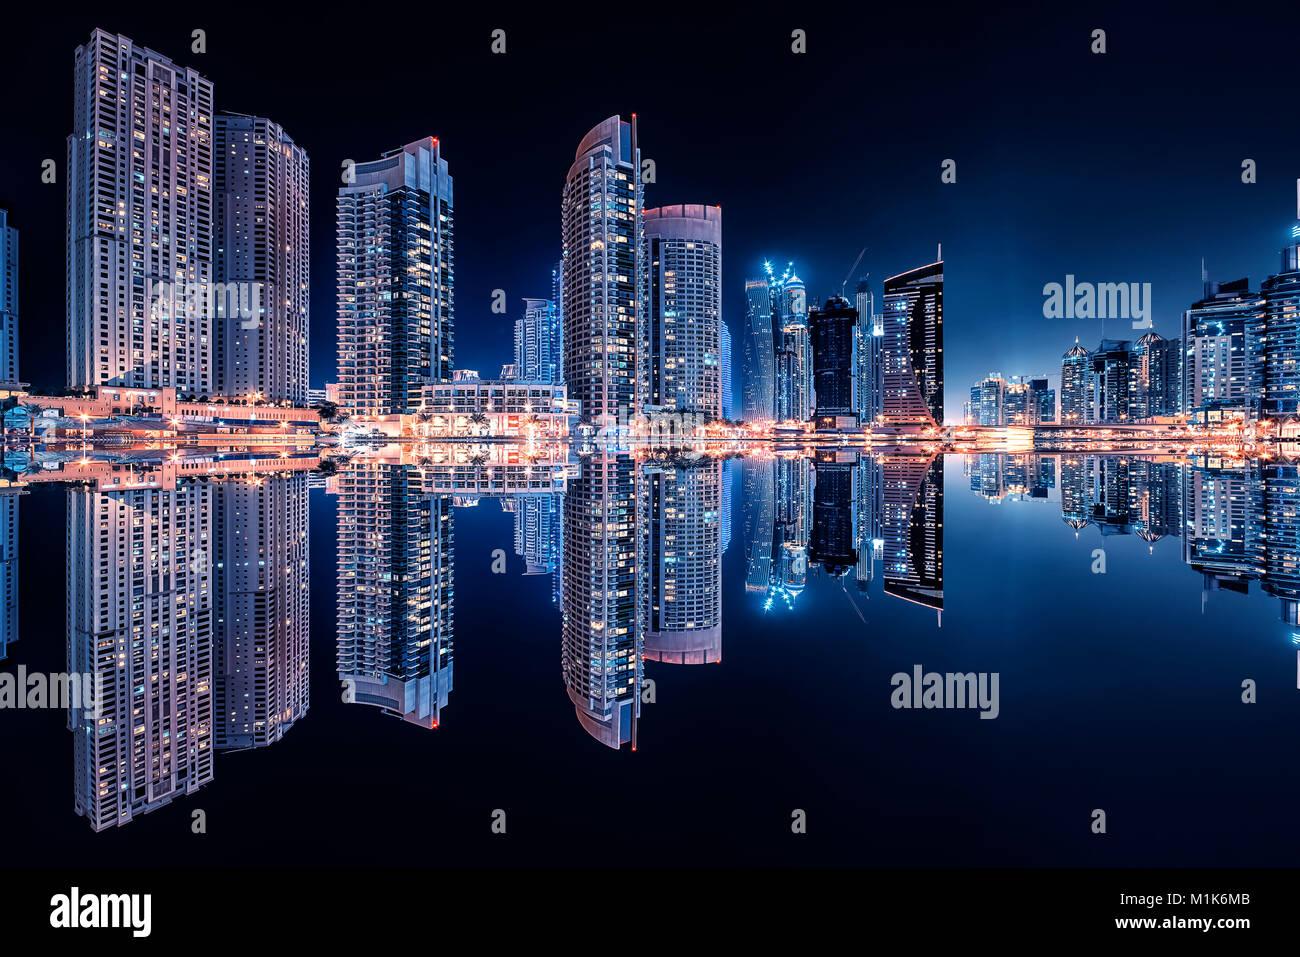 Dubai marina reflection by night - Stock Image